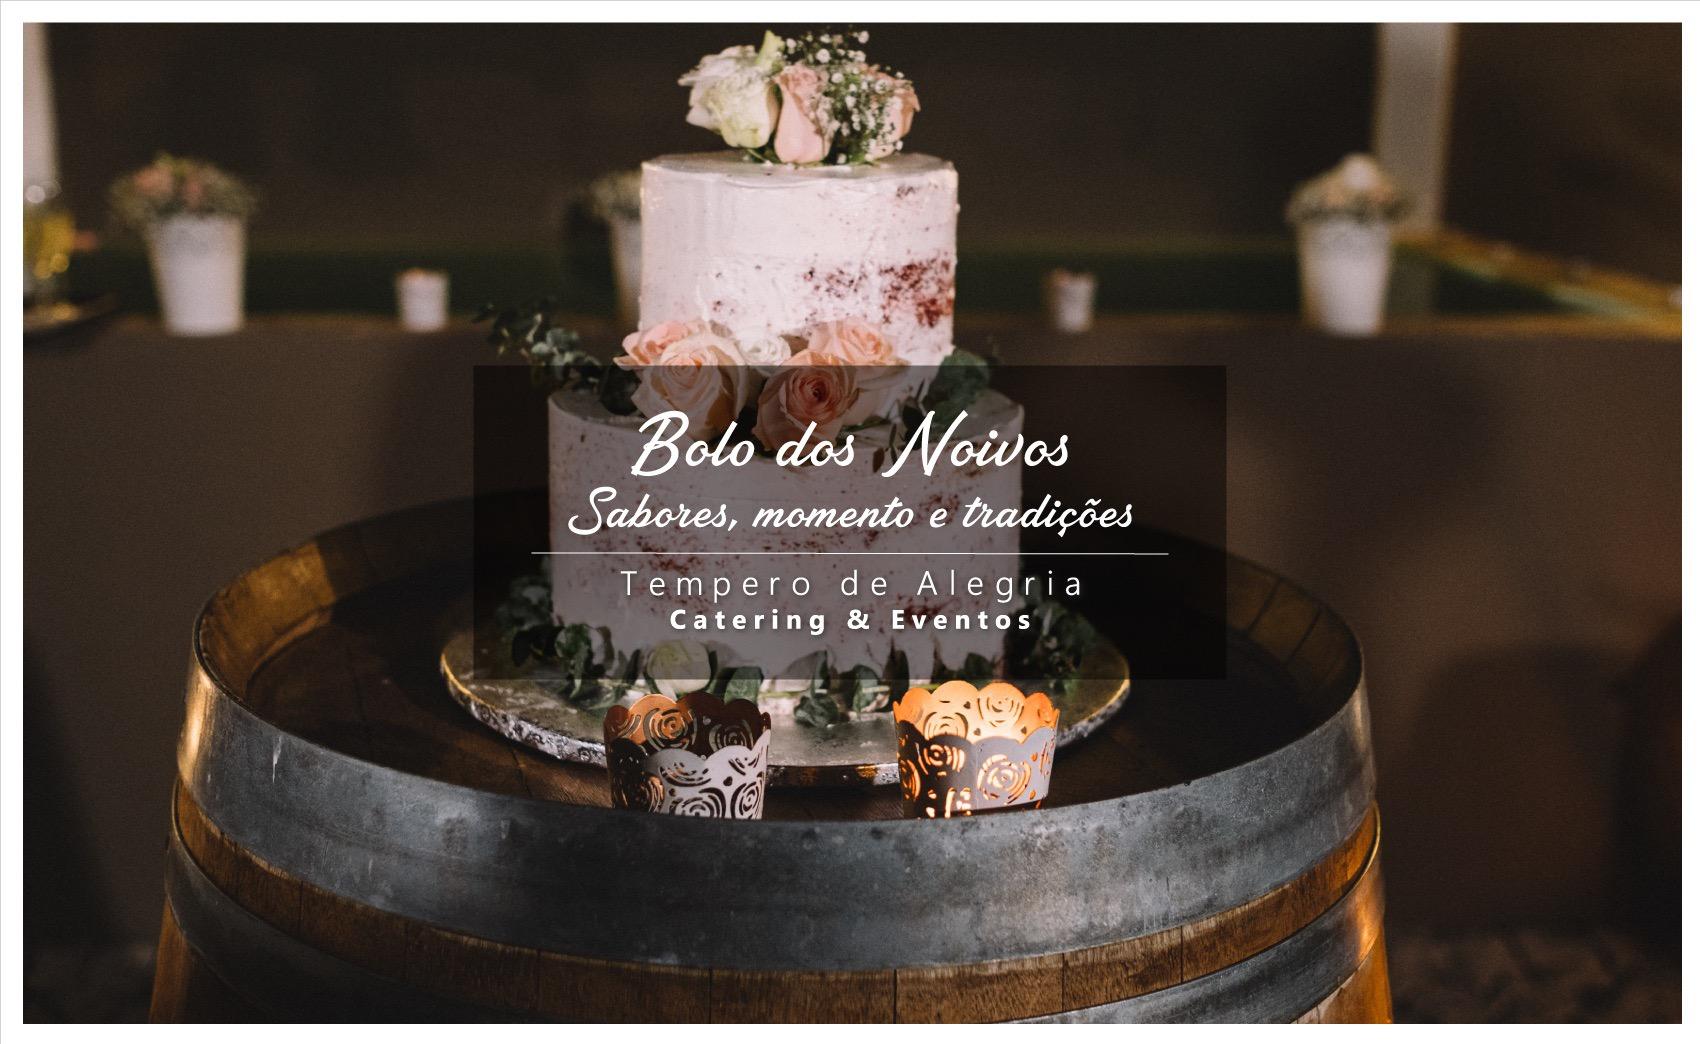 O Bolo dos Noivos – Sabores, momento e tradições   Blog   Tempero de Alegria – Catering e Eventos